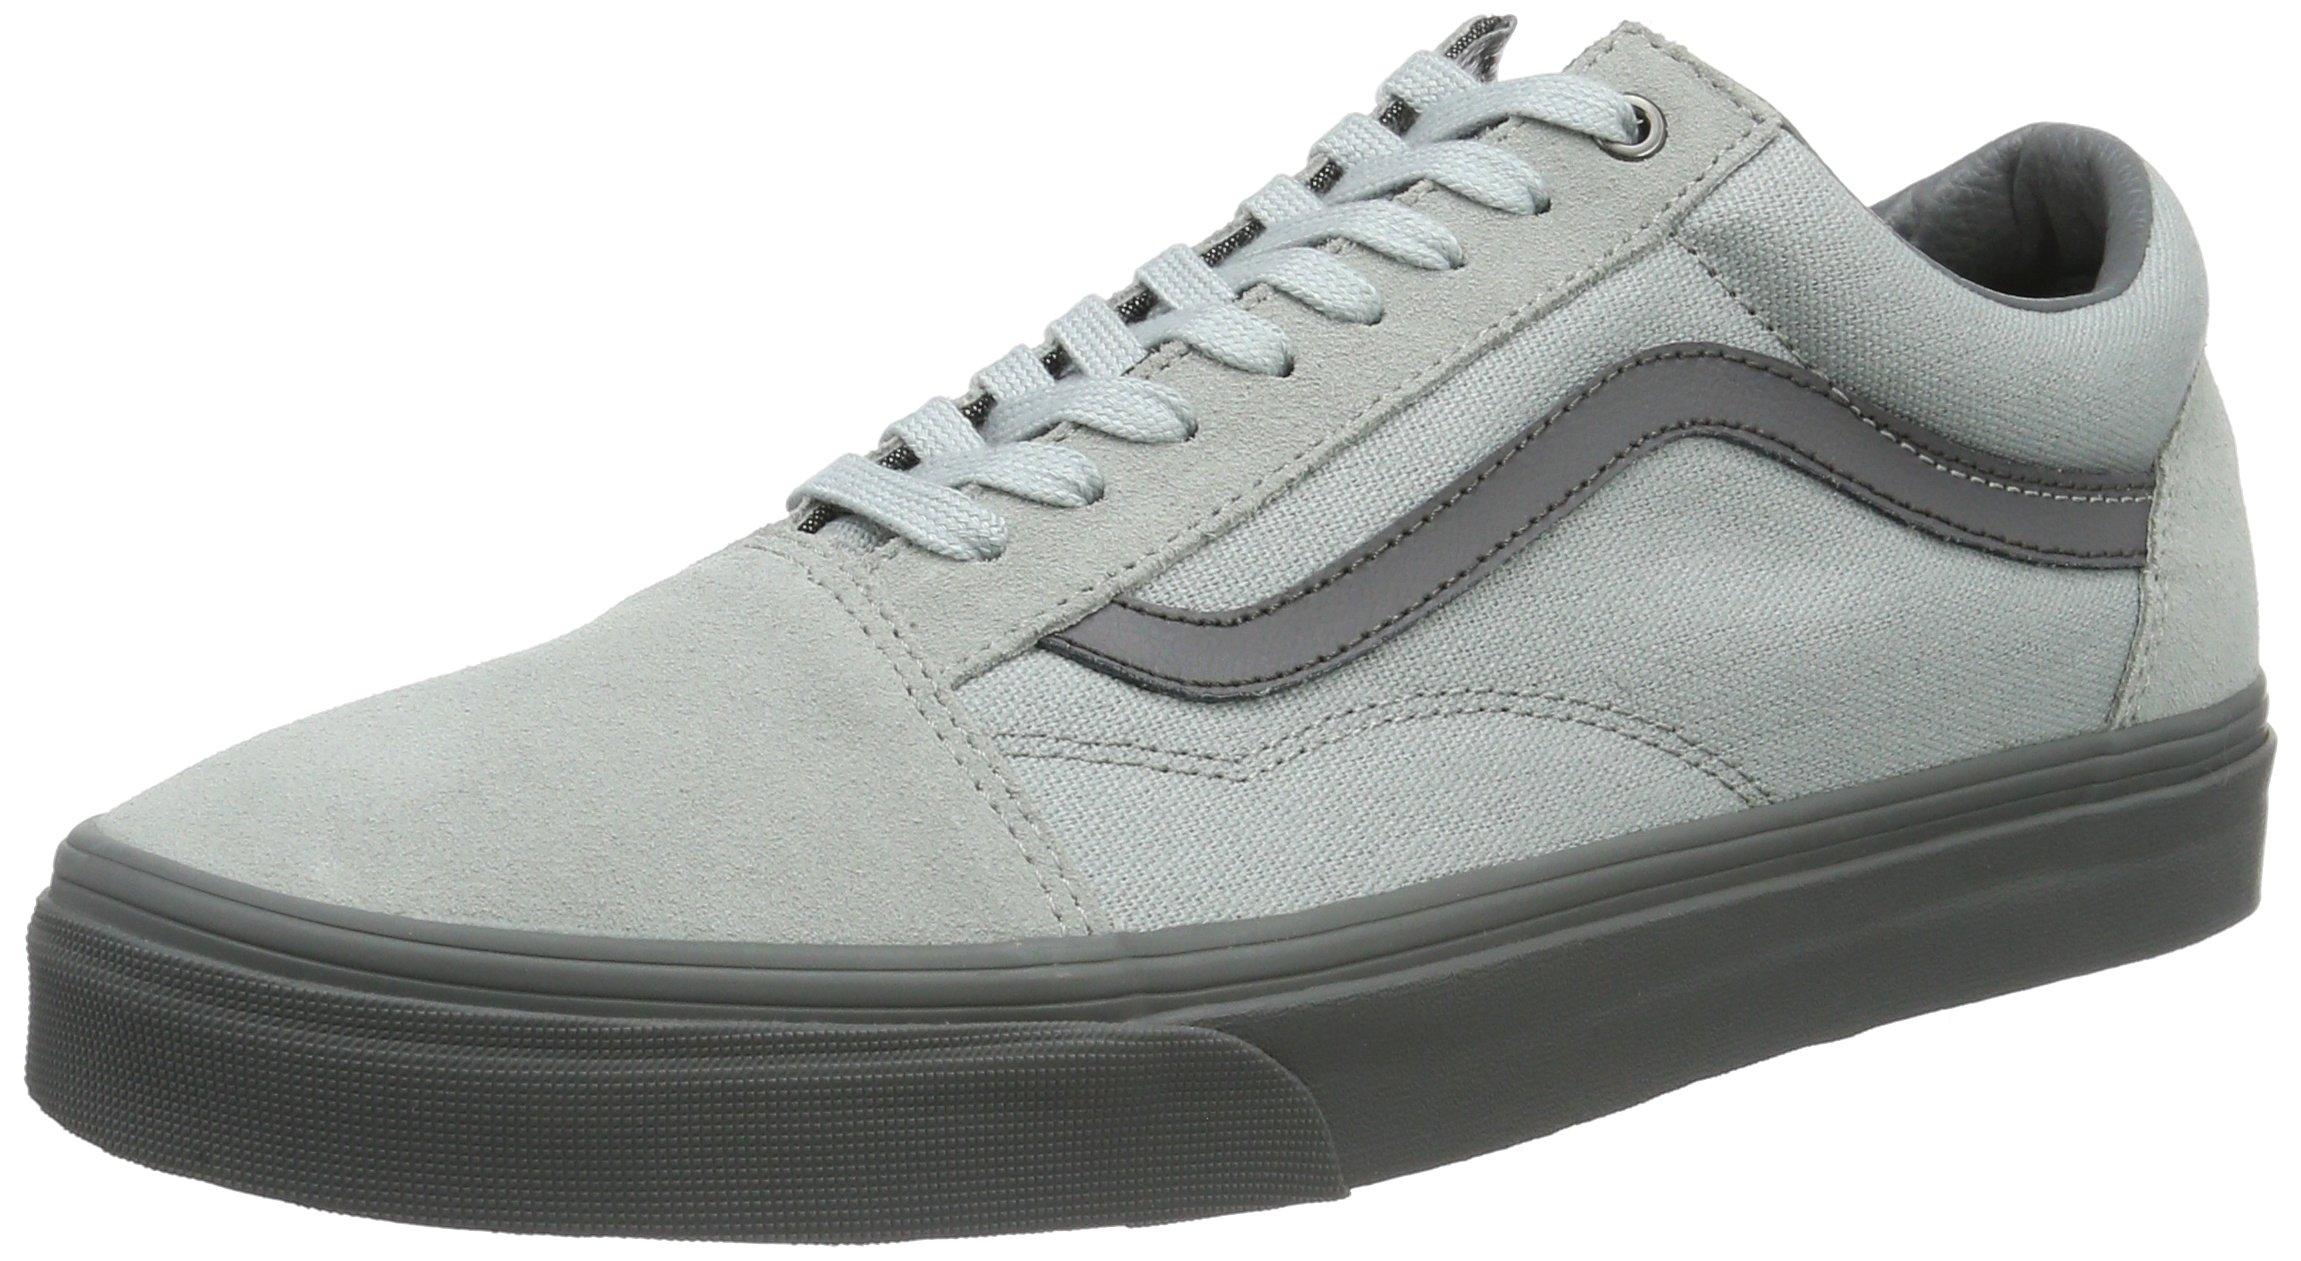 a137b84e7a5fa1 Galleon - Vans Unisex Old Skool (C D) High-Rise Pewter Skate Shoe 9.5 Men US  11 Women US